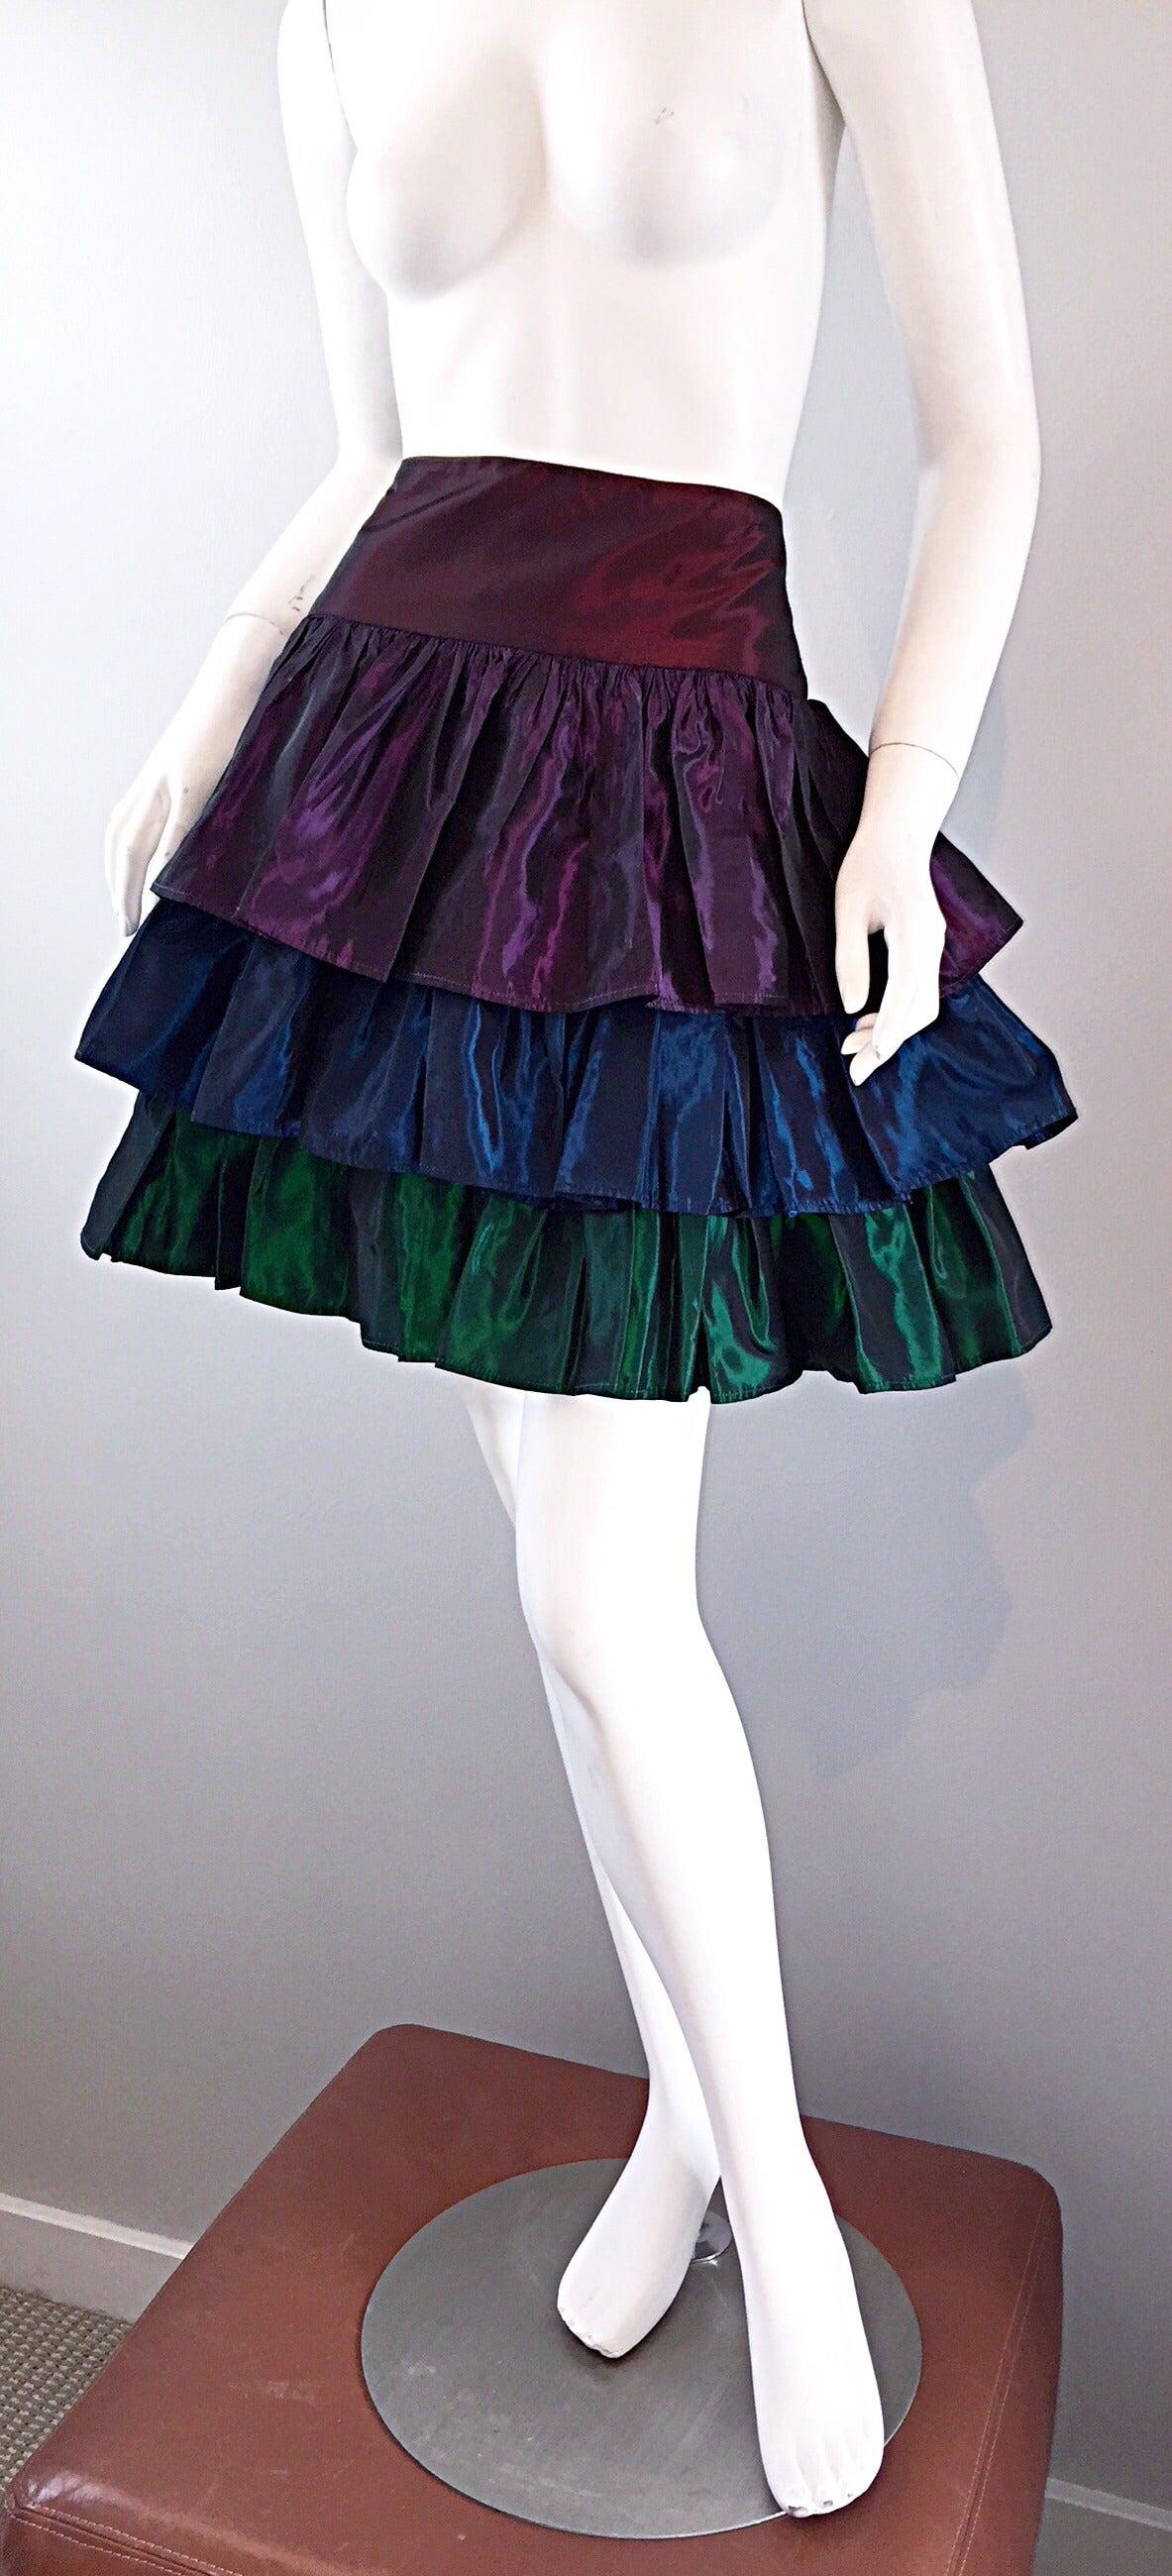 Kalinka For Bergdorf Goodman Tiered Taffeta ' Rainbow ' Vintage Skirt 2